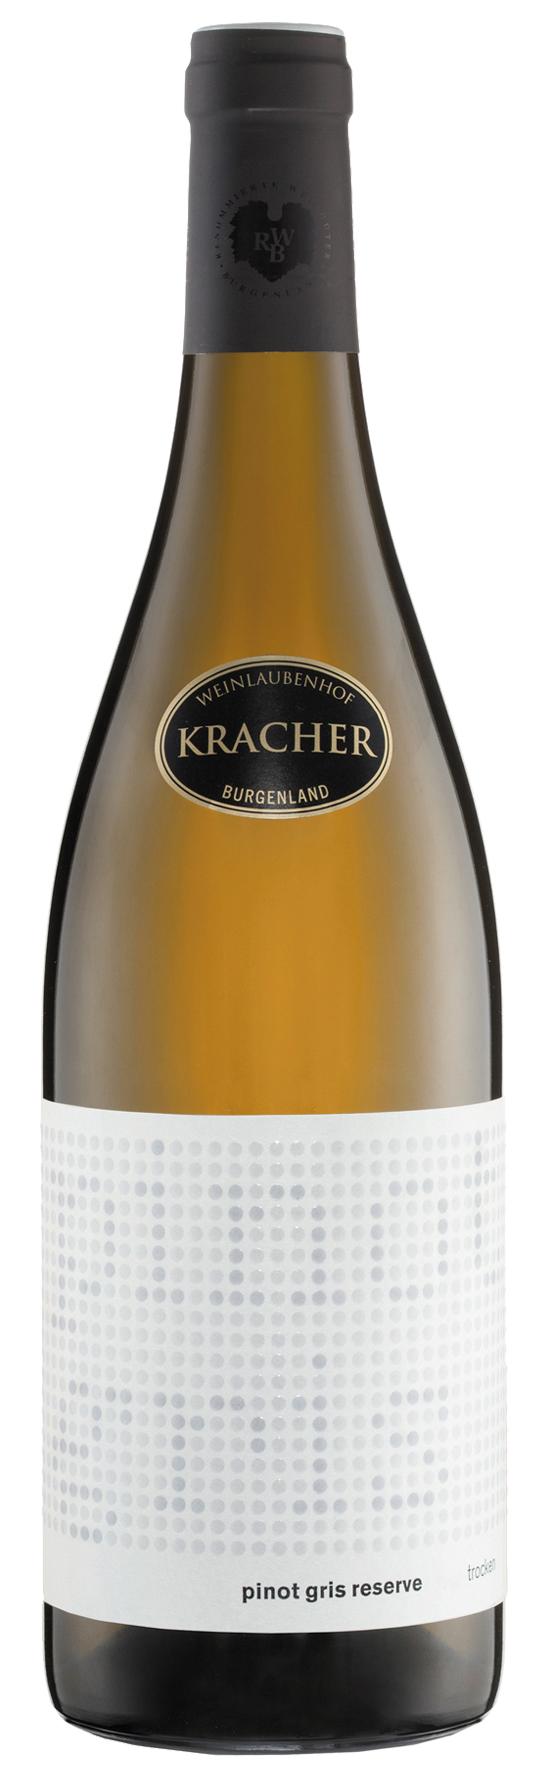 2015 Pinot Gris WEINLAUBENHOF KRACHER BURGENLAND